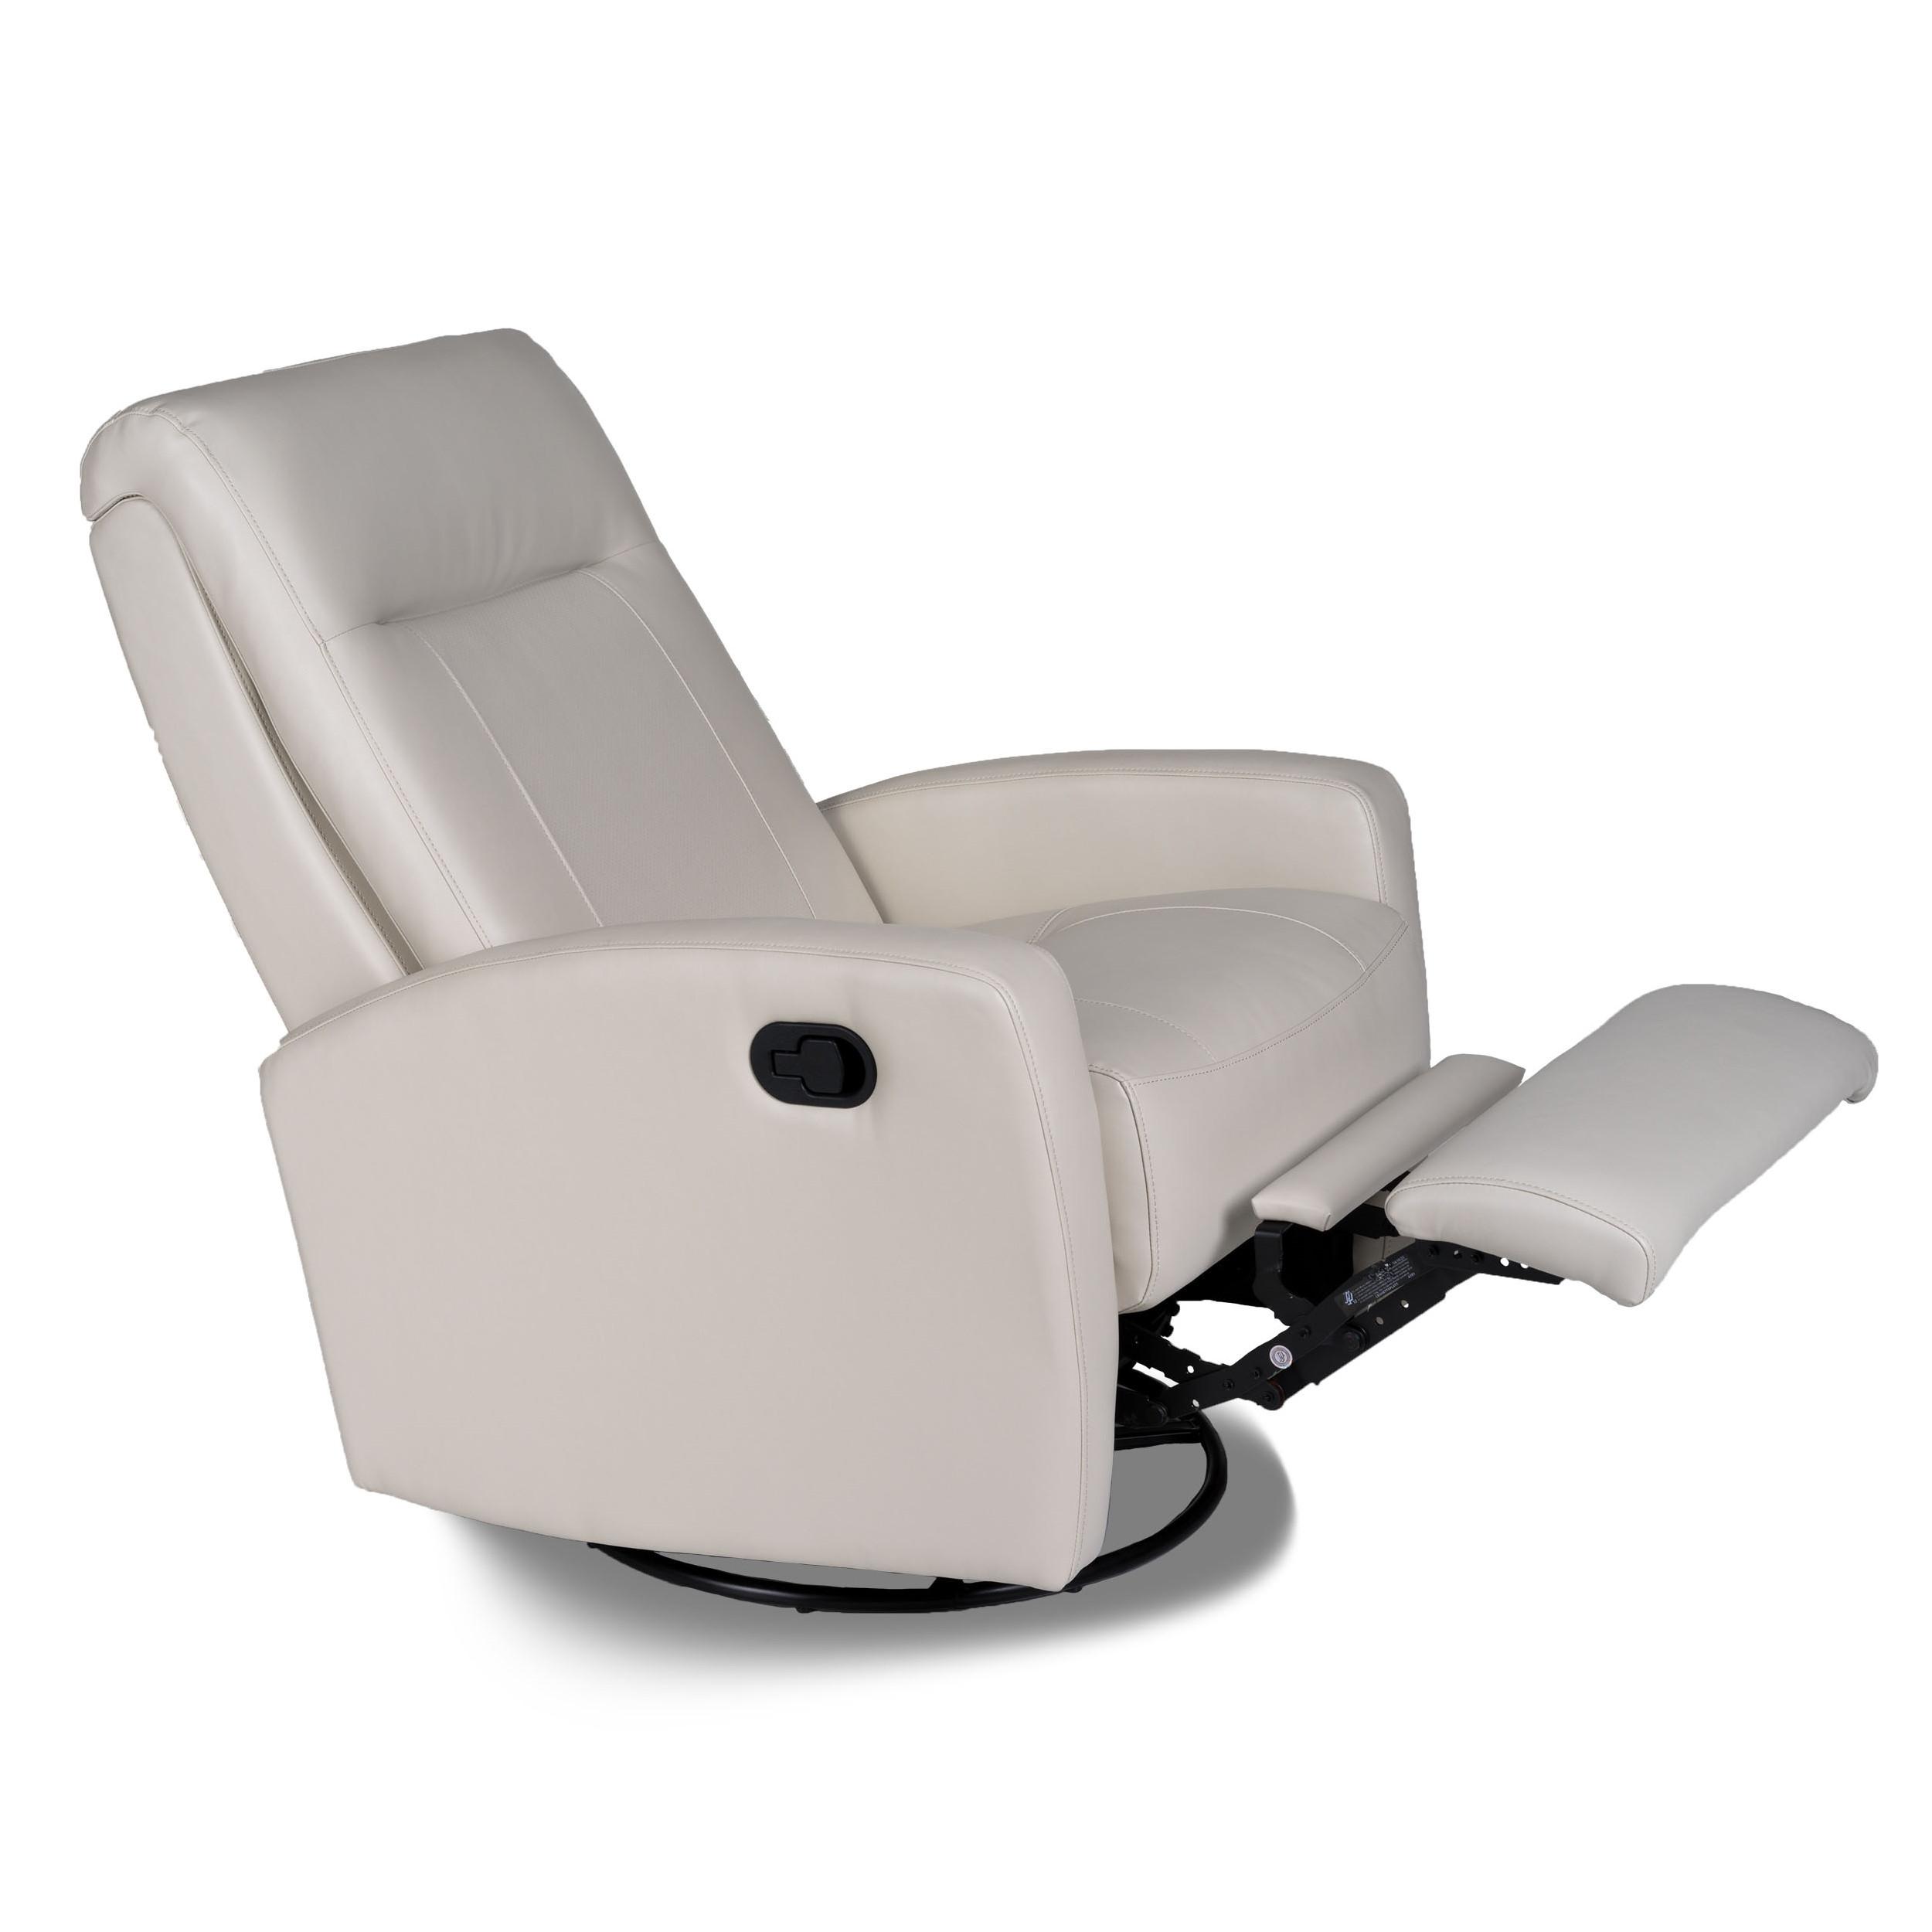 Rocker Glider Recliner | Babies R Us Nursing Chair | Glider Recliner